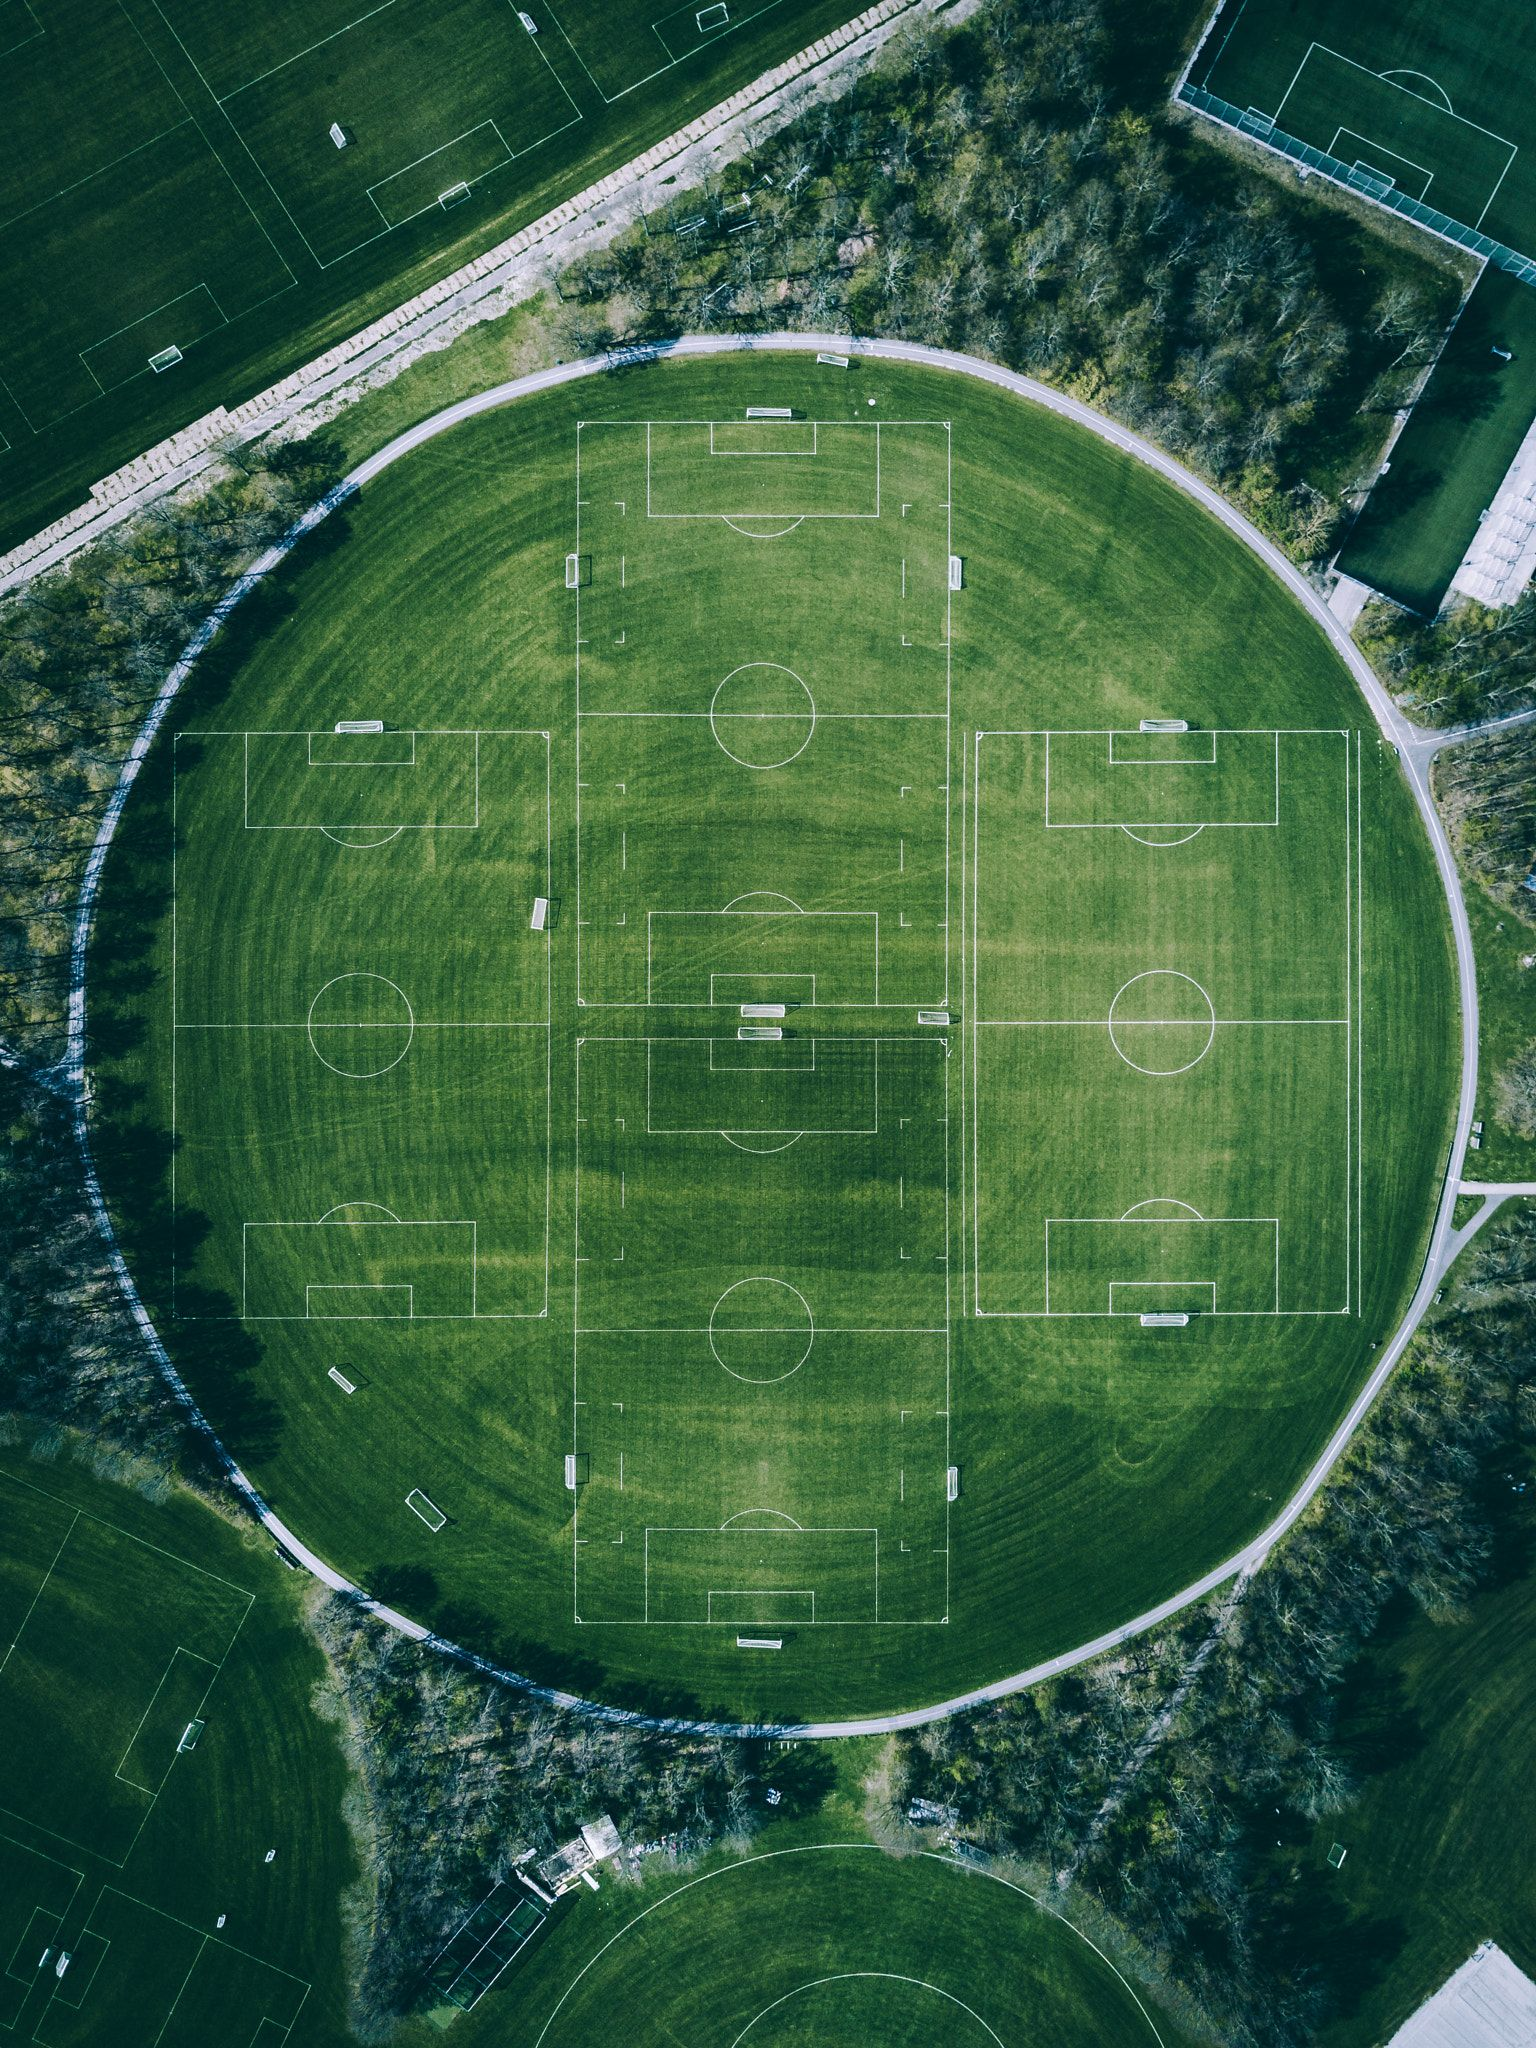 Greet Wheel Of Soccer Soccer Football Pitch Soccer Stadium